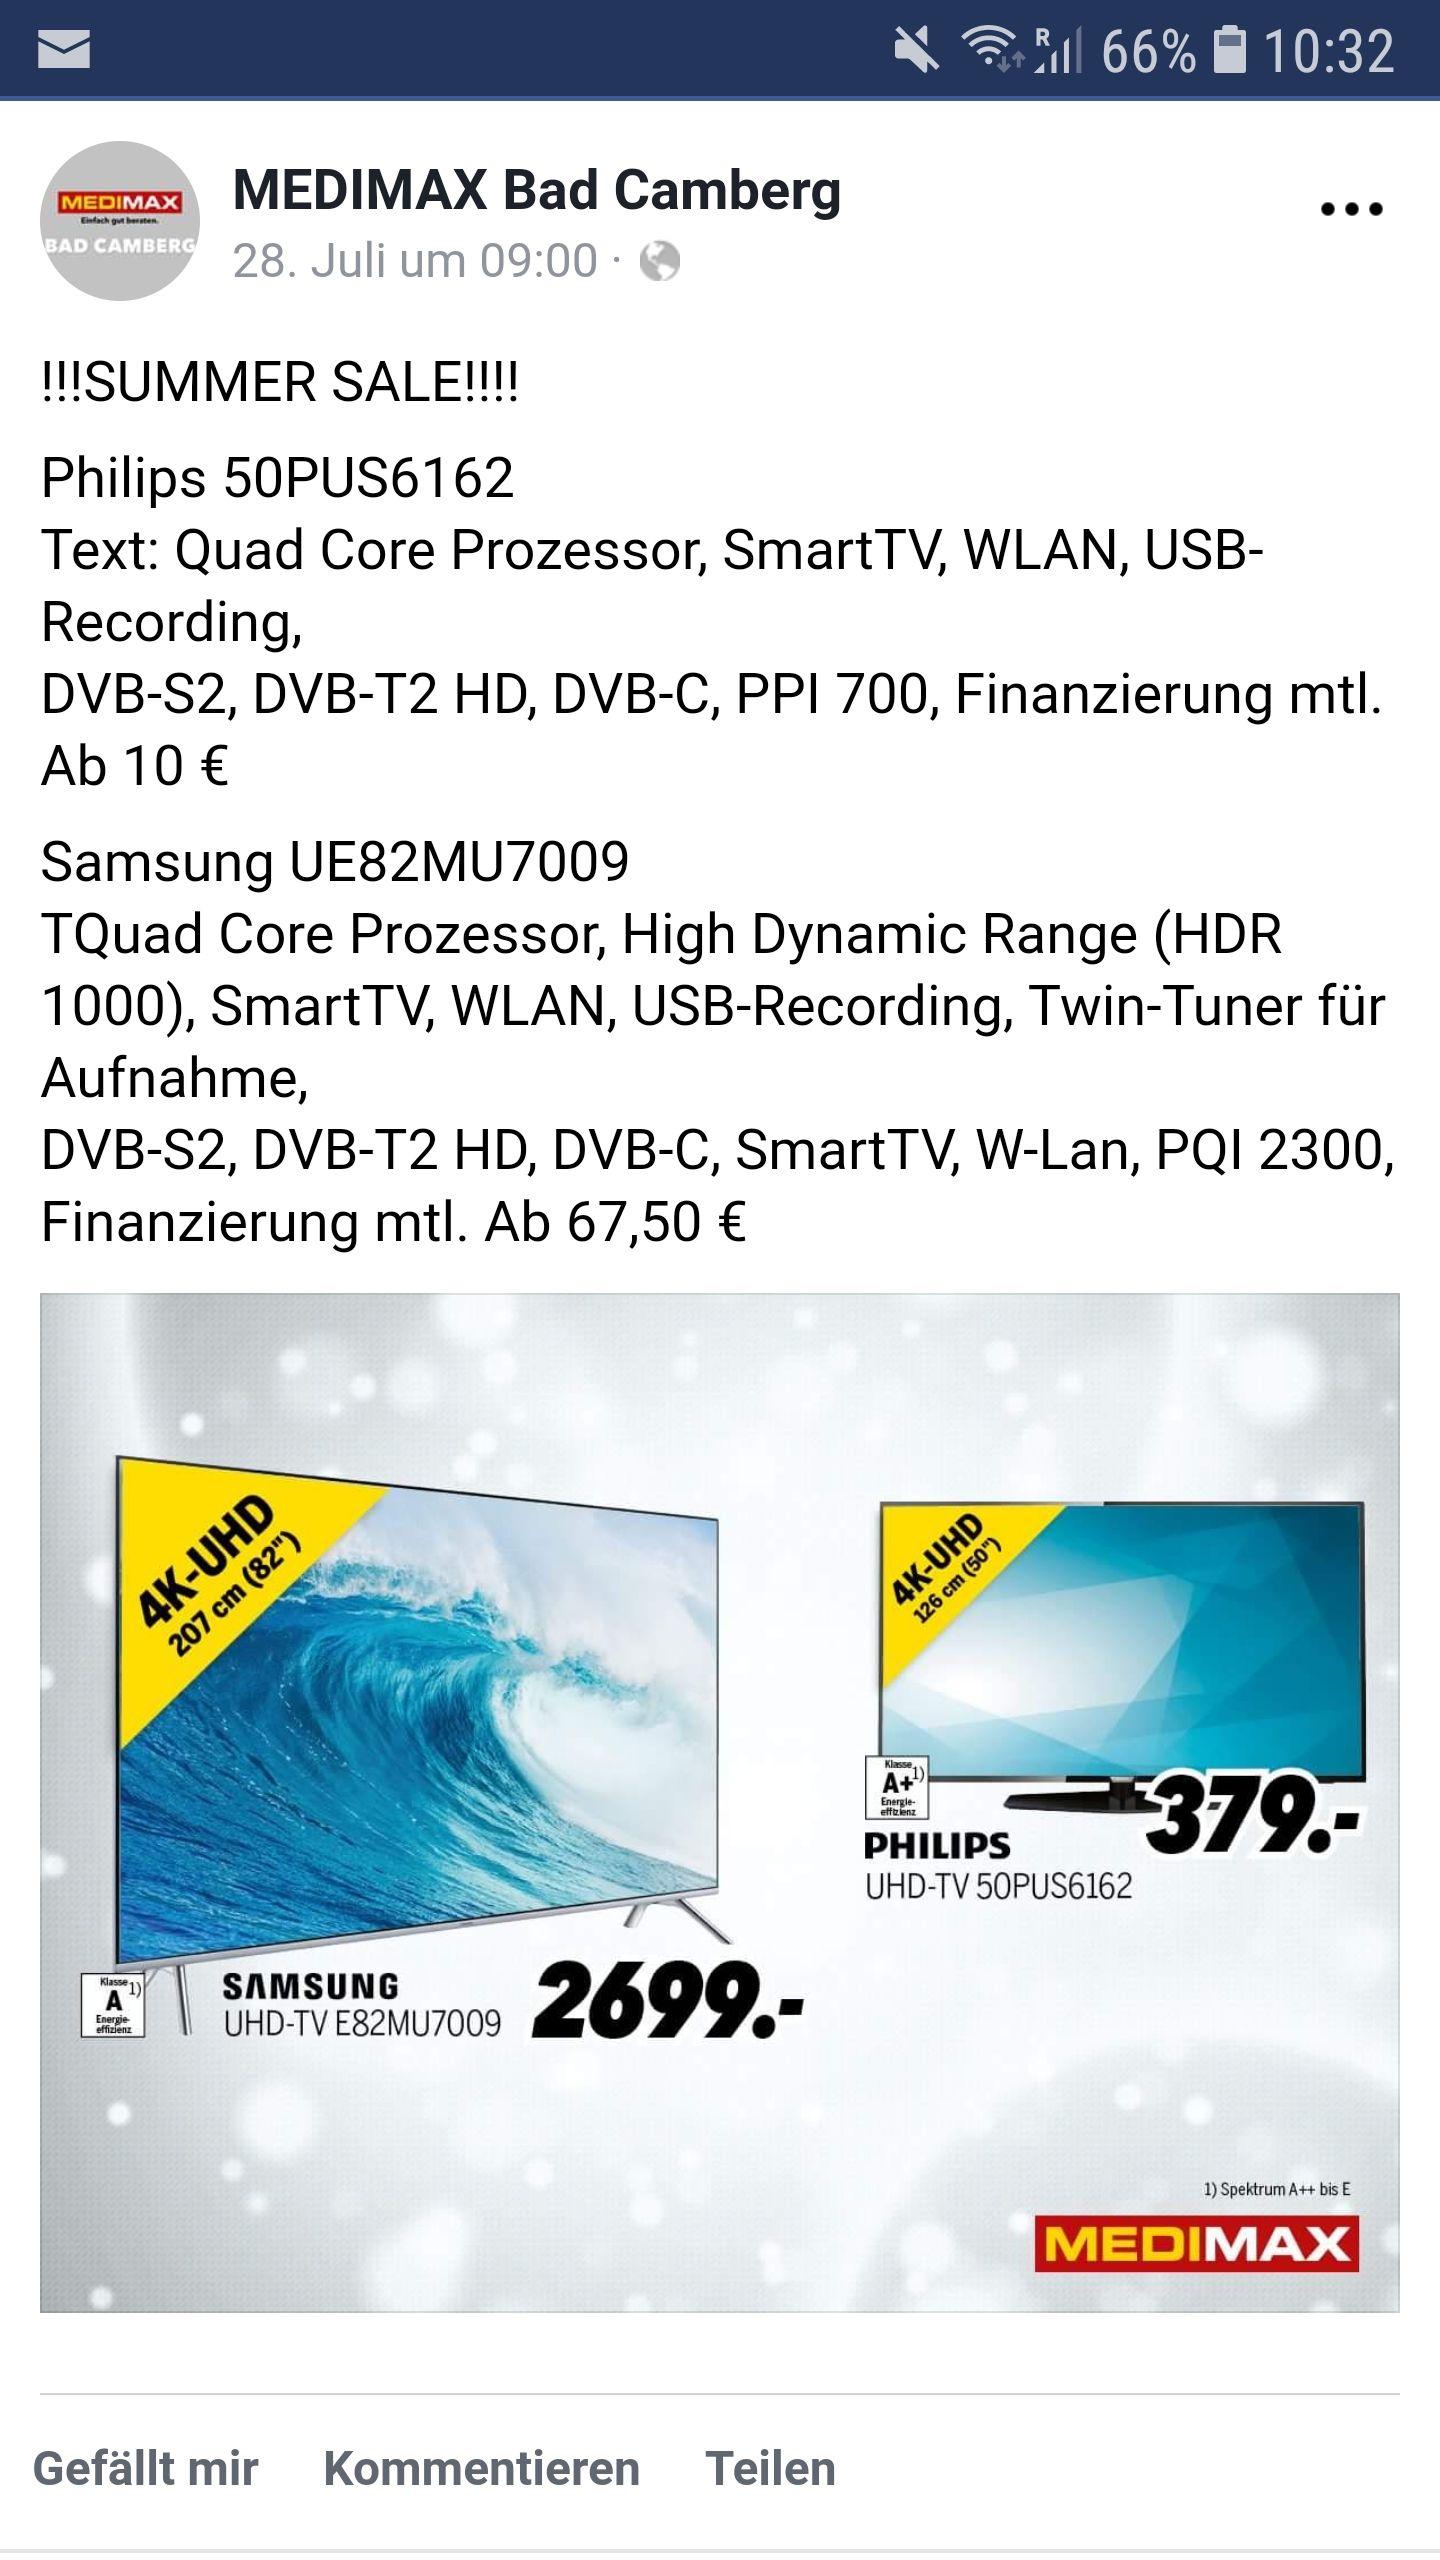 [Lokal] Samsung UE82MU7009 Medi Max Bad Camberg